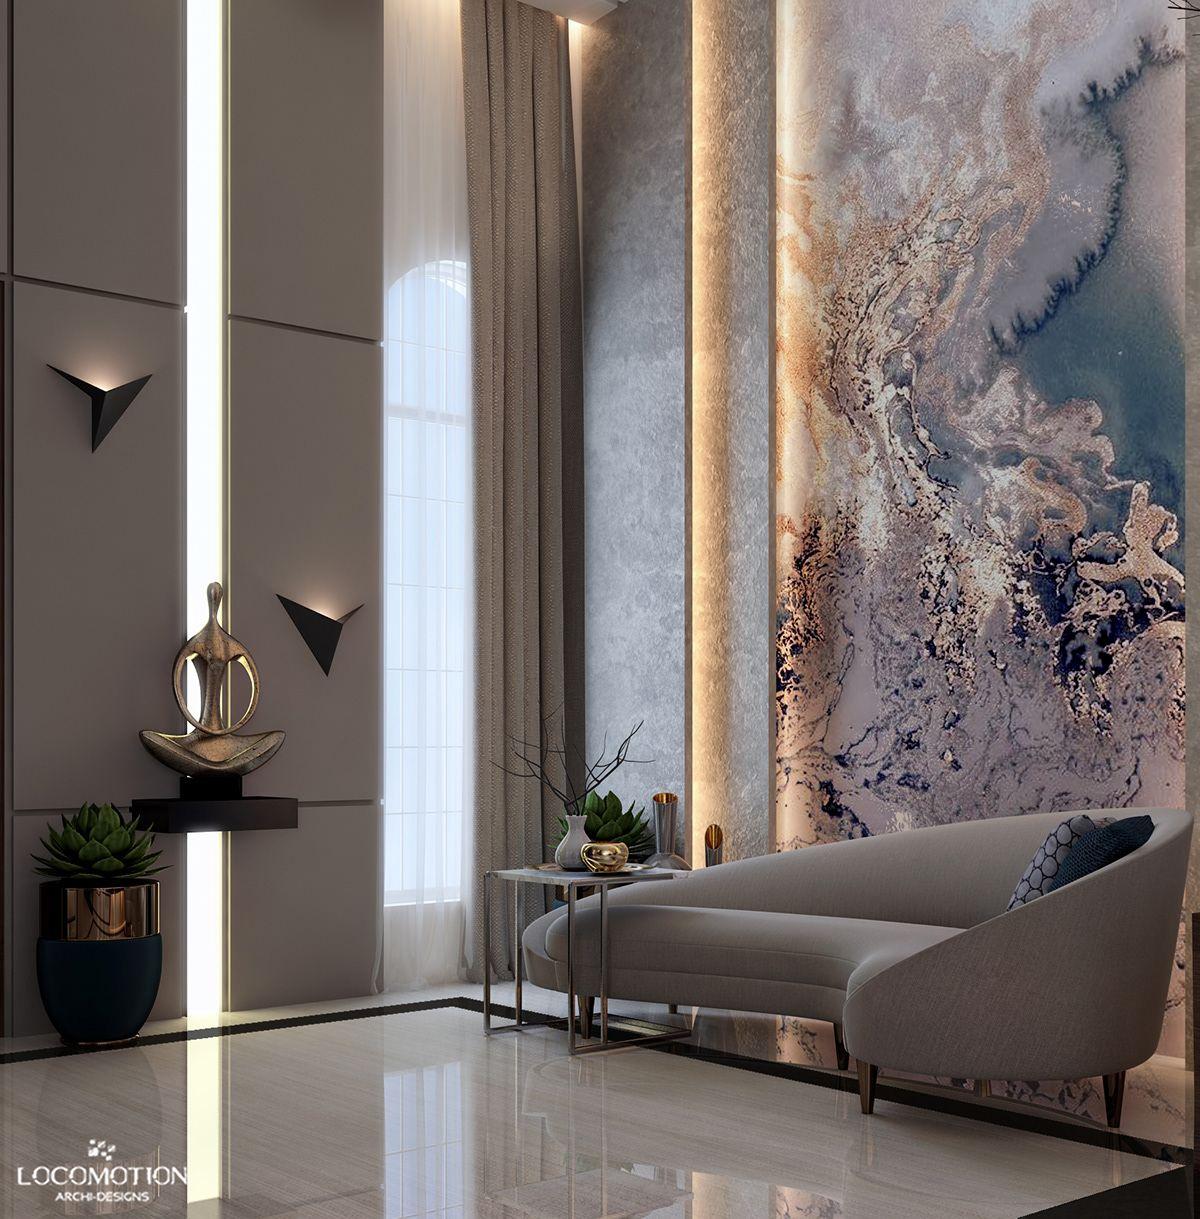 New Home Designs Latest Modern Homes Luxury Interior: Living Room Decor Inspiration